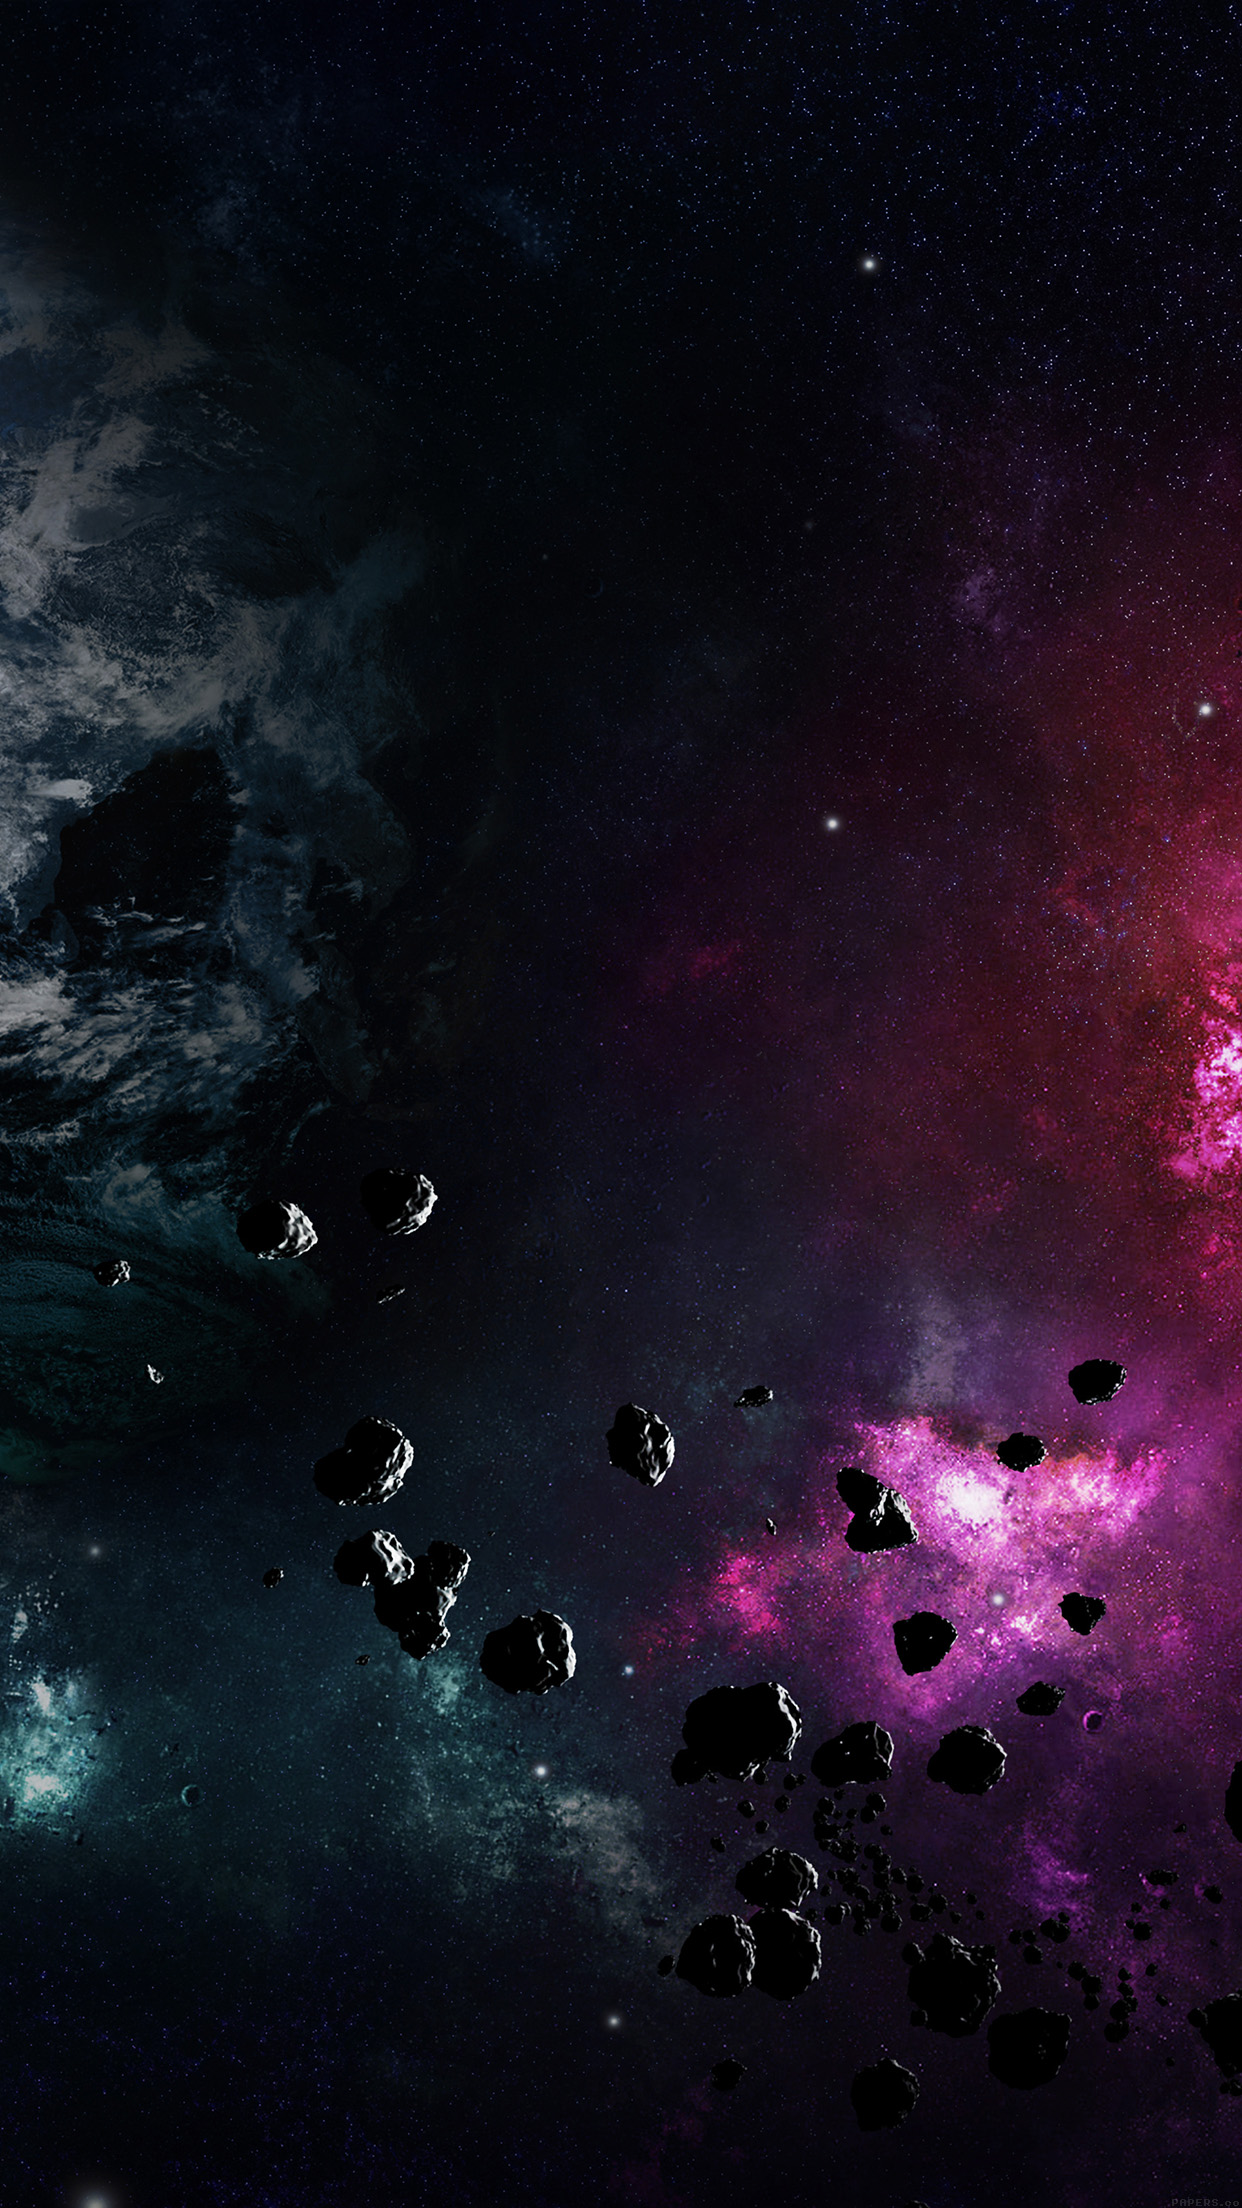 Cute Wallpaper For Macbook Mk21 Space Planet Stellar Dark Nature Papers Co